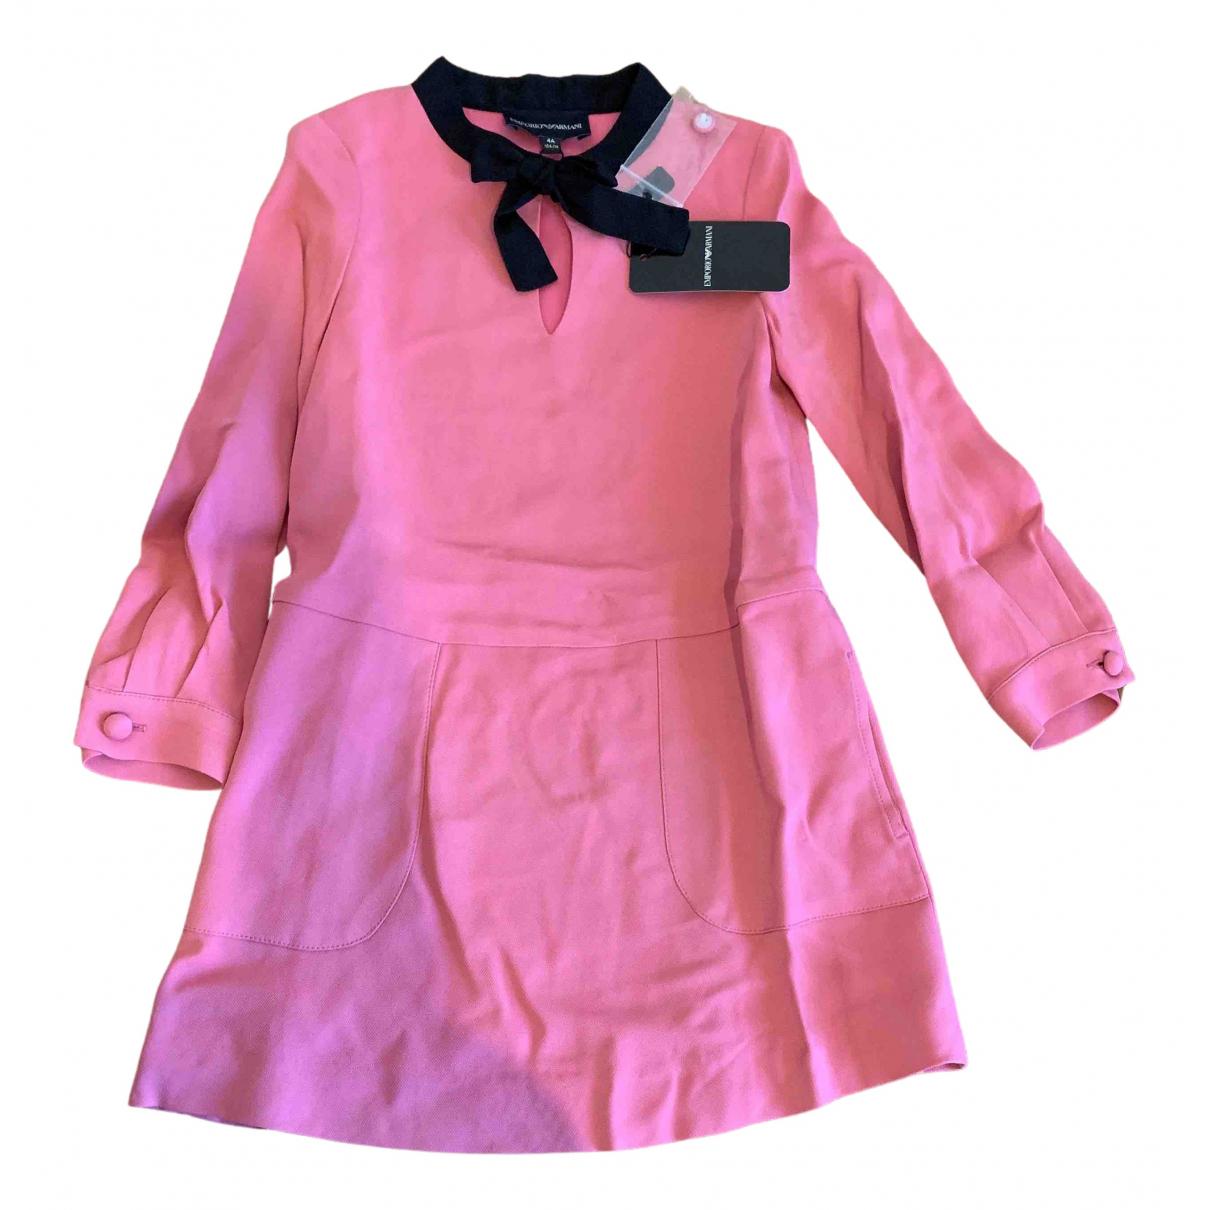 Emporio Armani \N Kleid in  Rosa Viskose